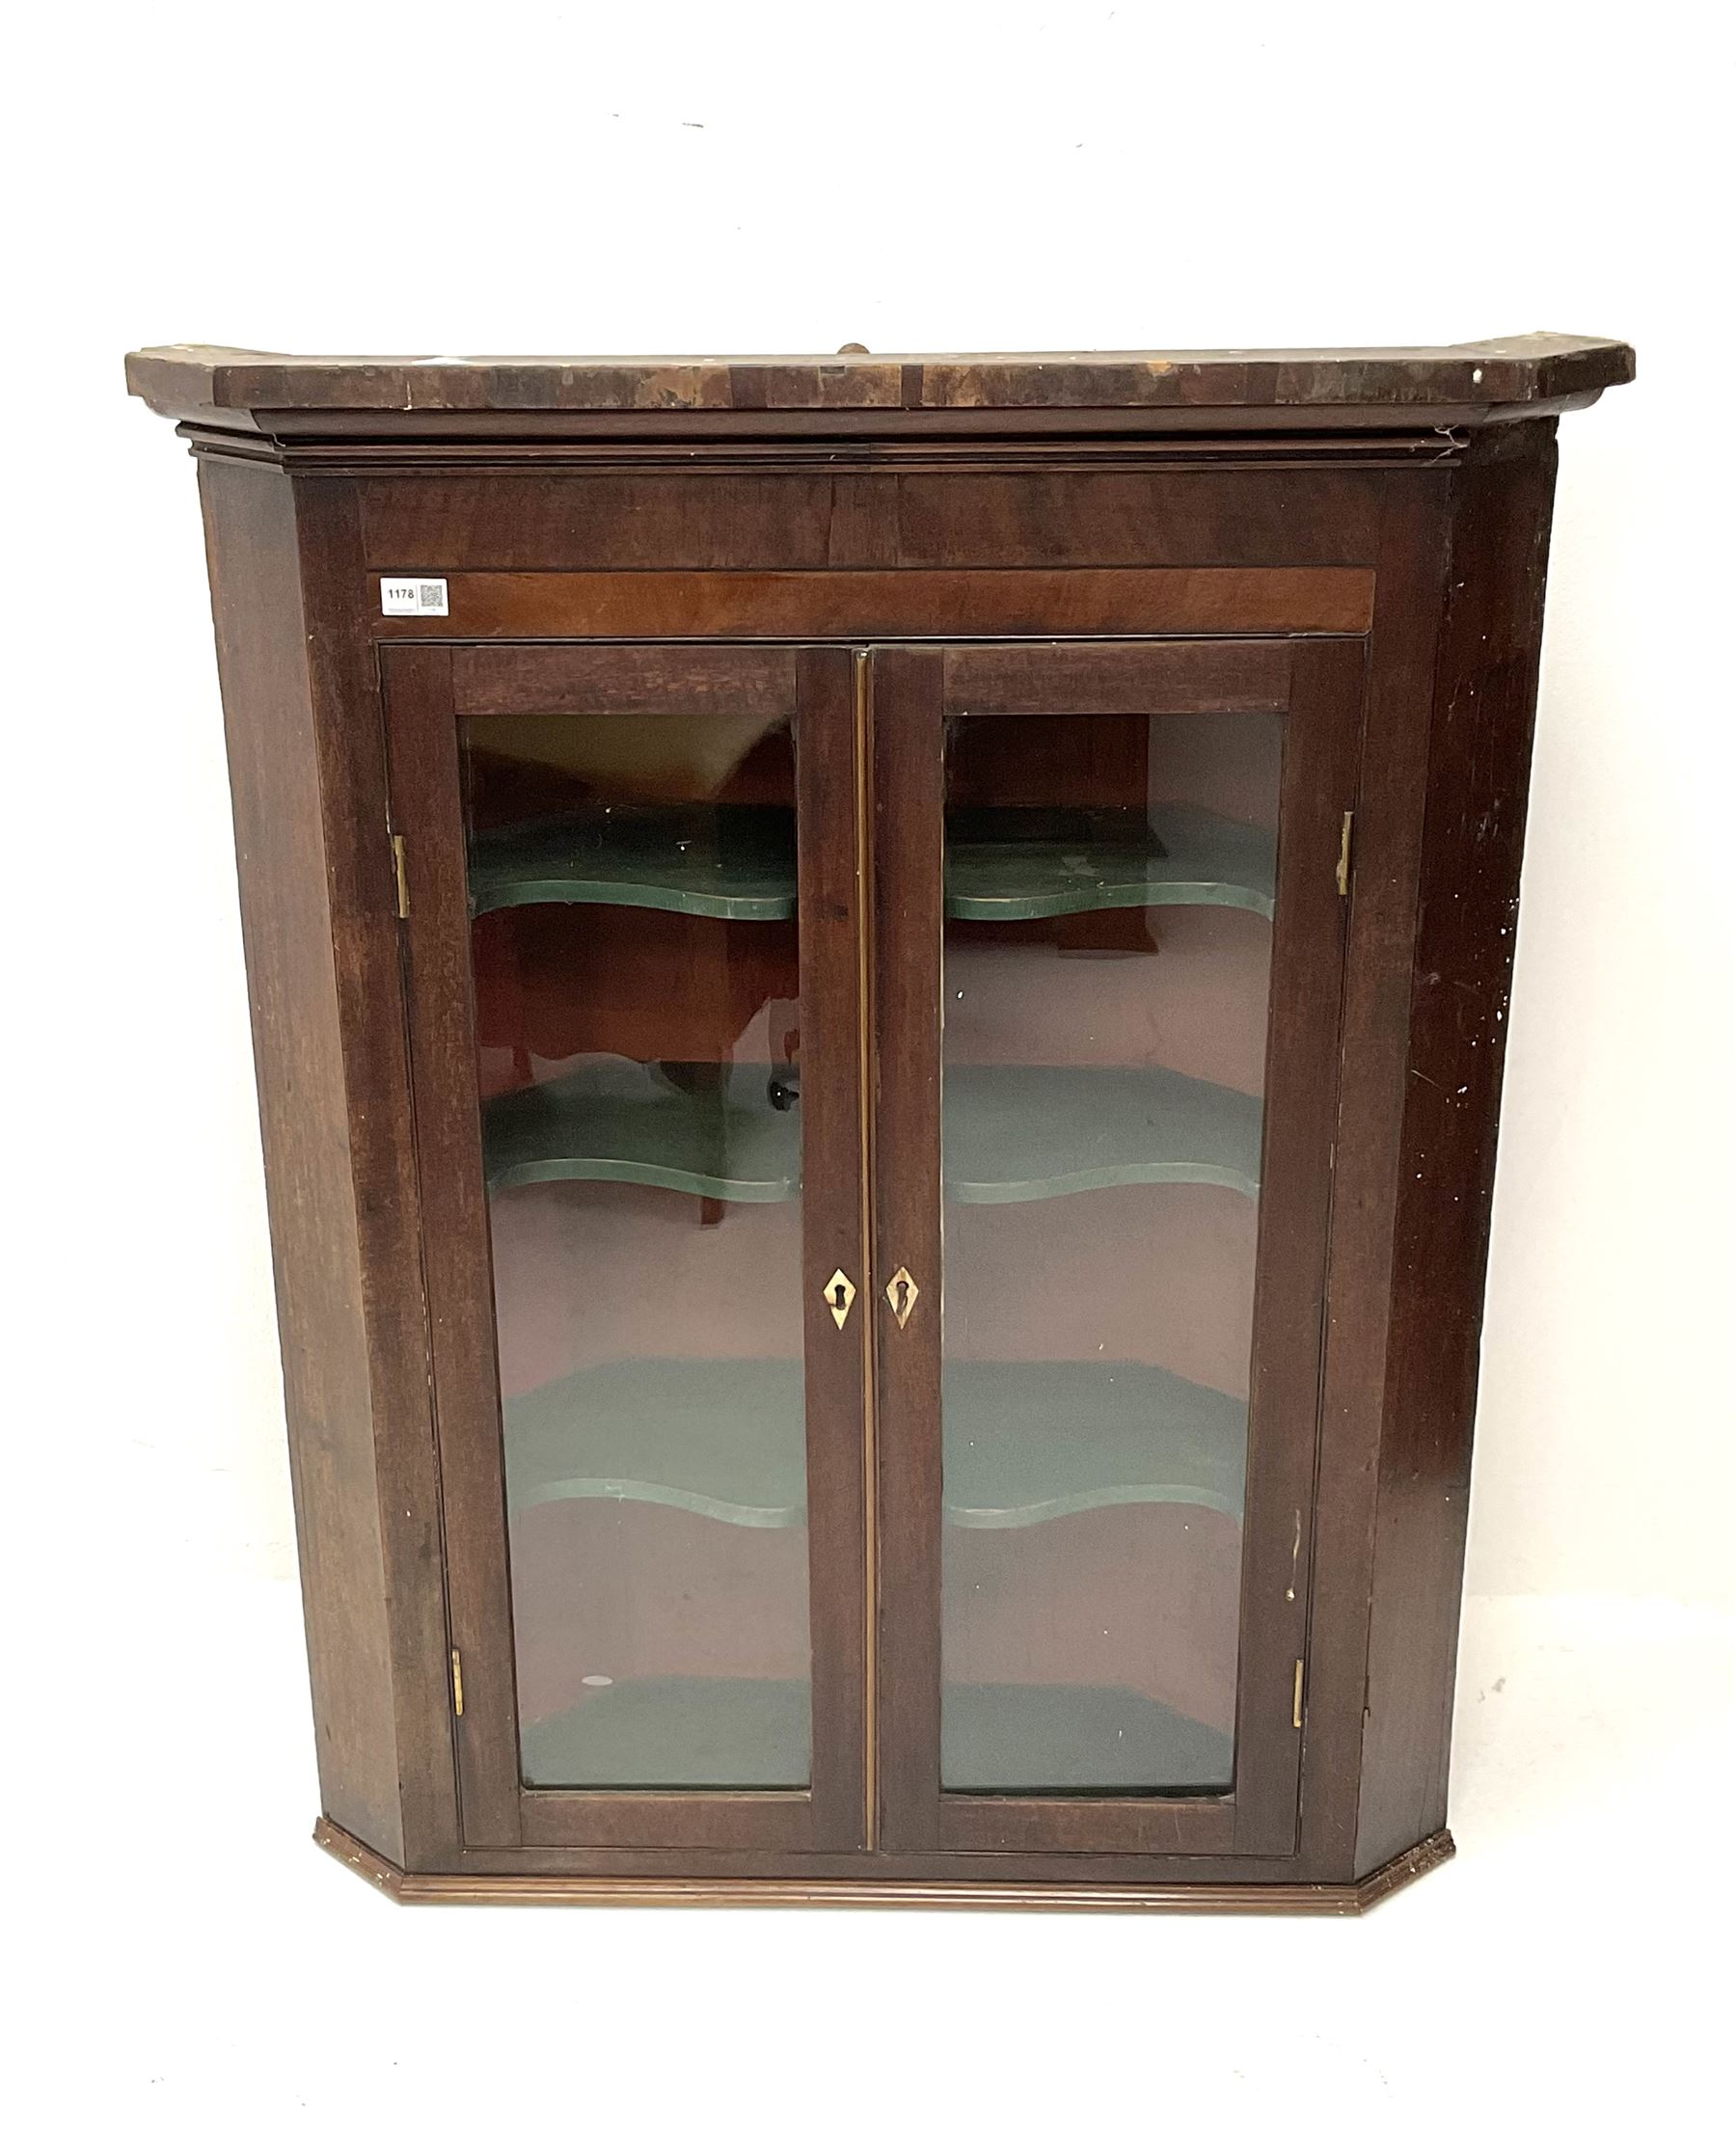 19th century mahogany hanging corner cabinet